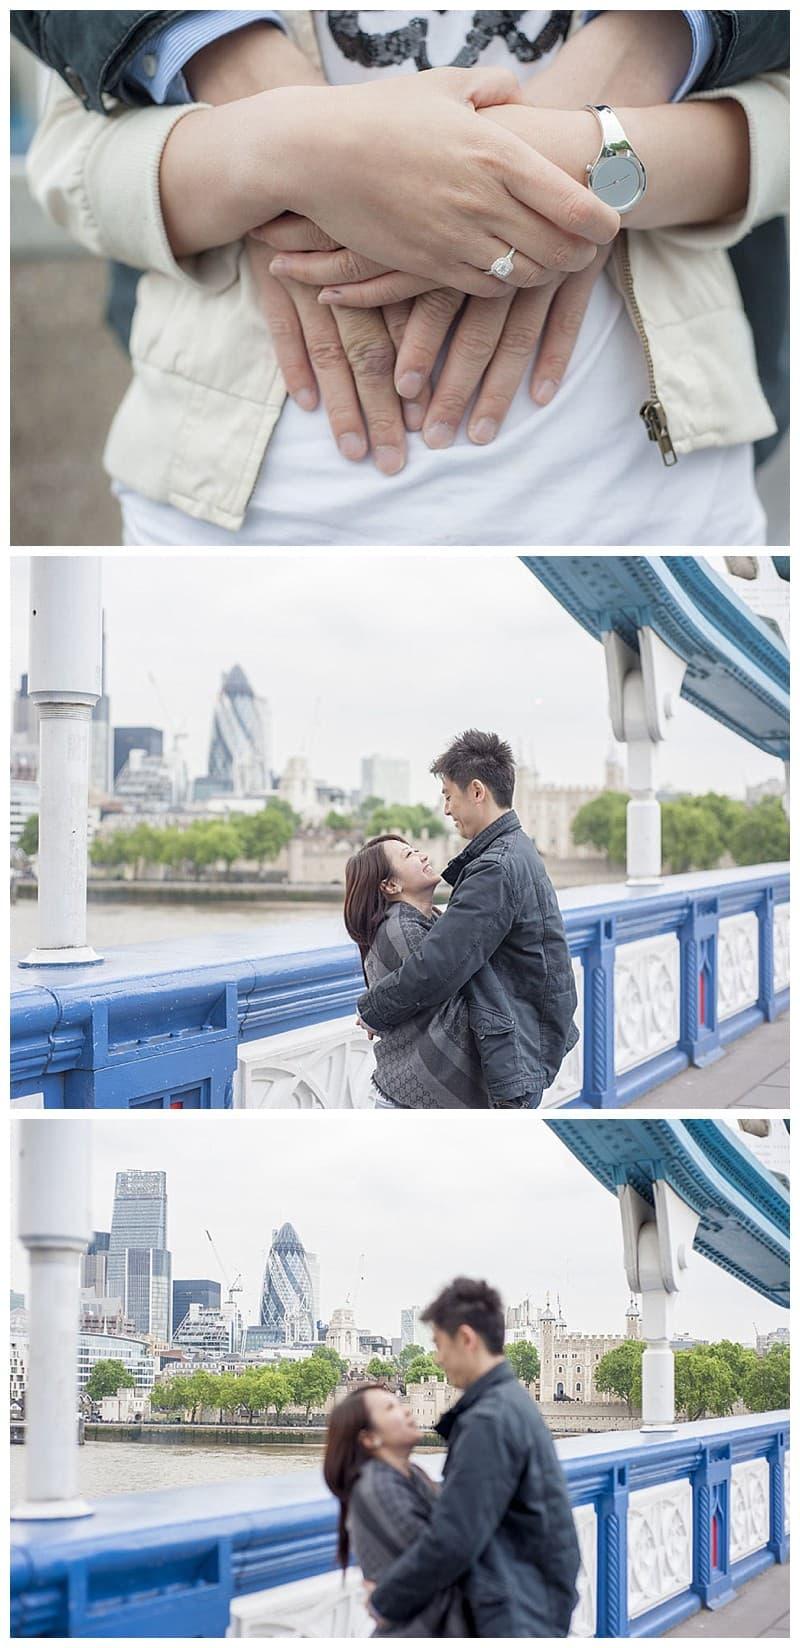 Kyle & Mandy Engagement Photoshoot, Tower Bridge, London, Benjamin Wetherall Photography0018